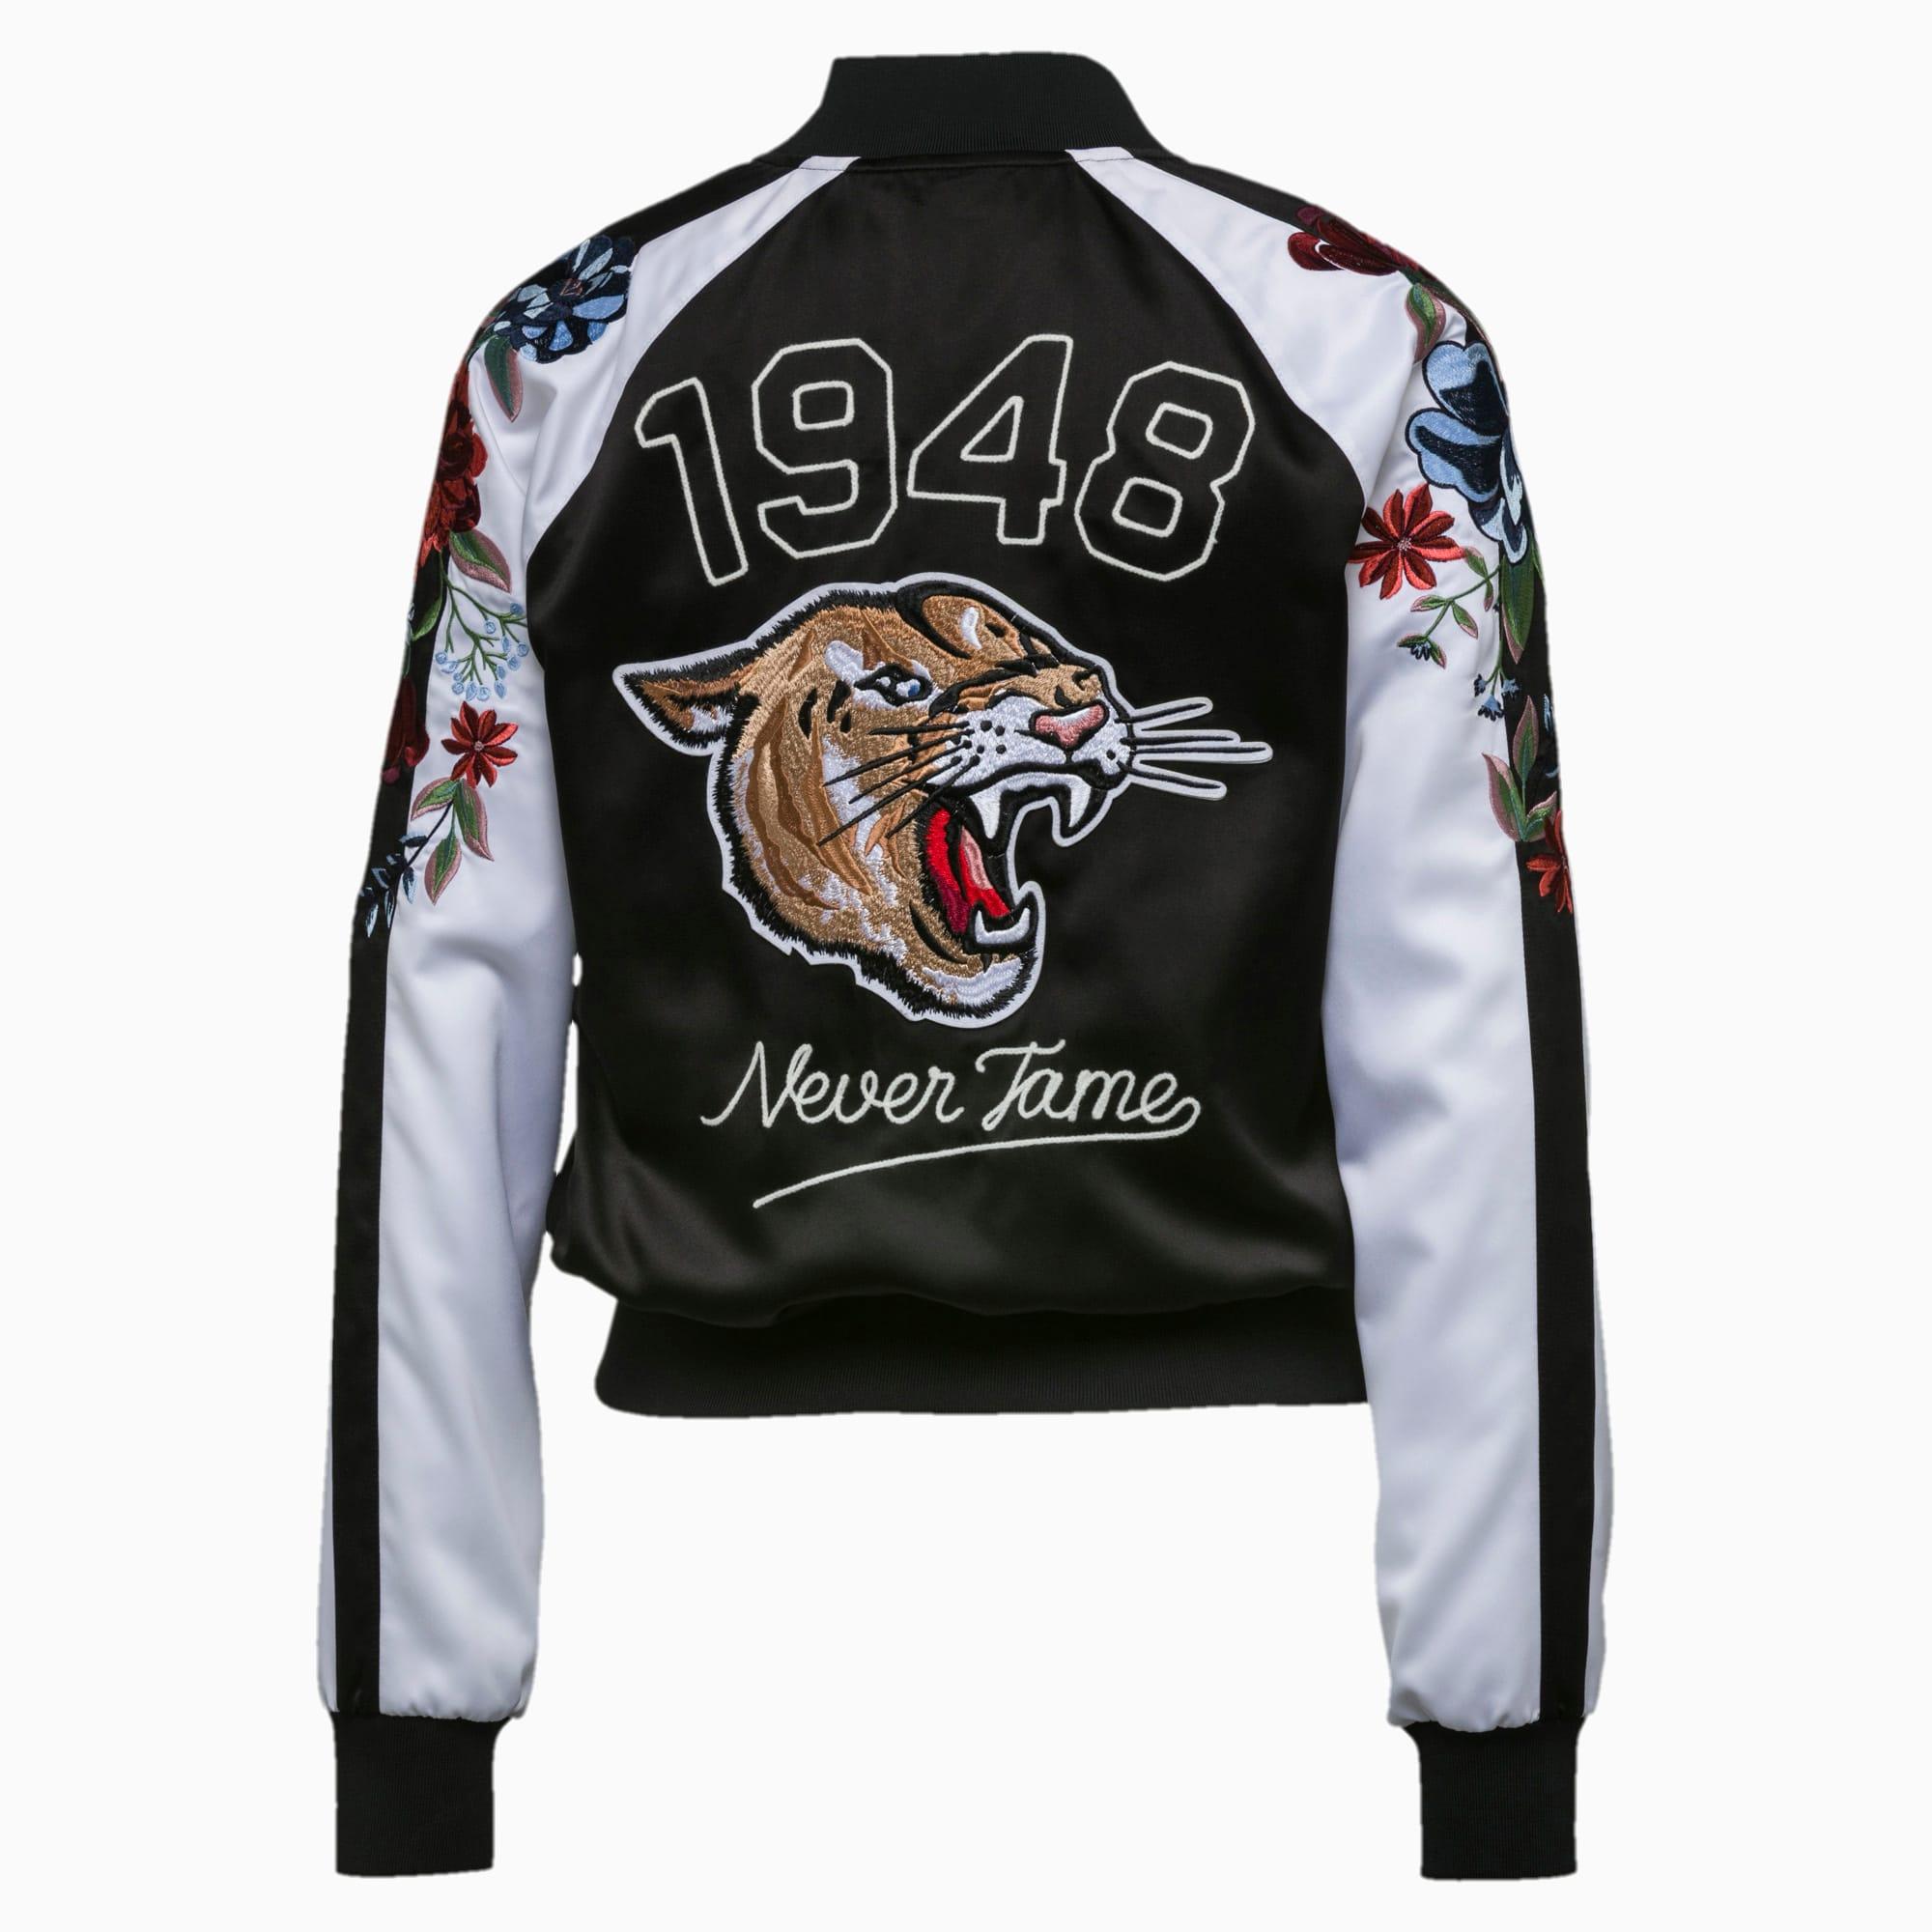 Premium Archive T7 Women's Tracksuit Jacket | PUMA Clothing